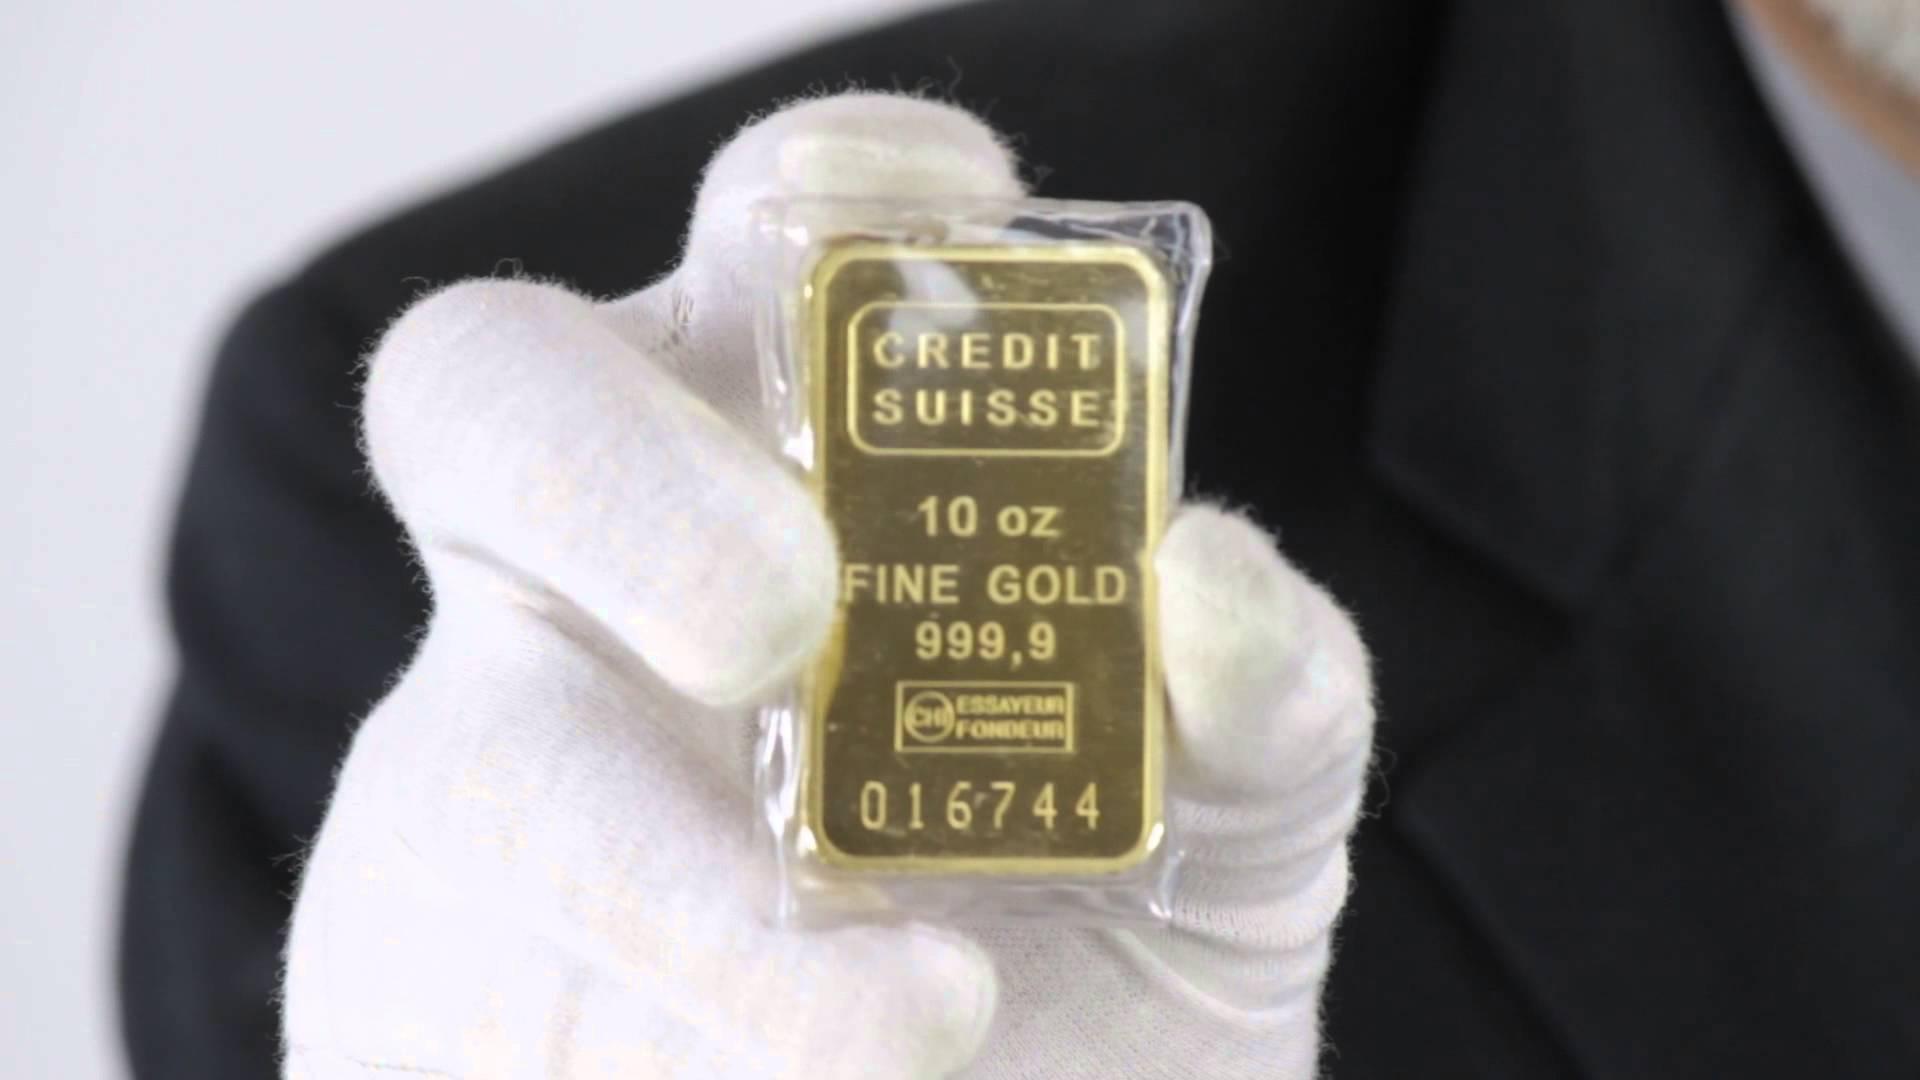 Cara berinvestasi emas batangan via Youtube.com